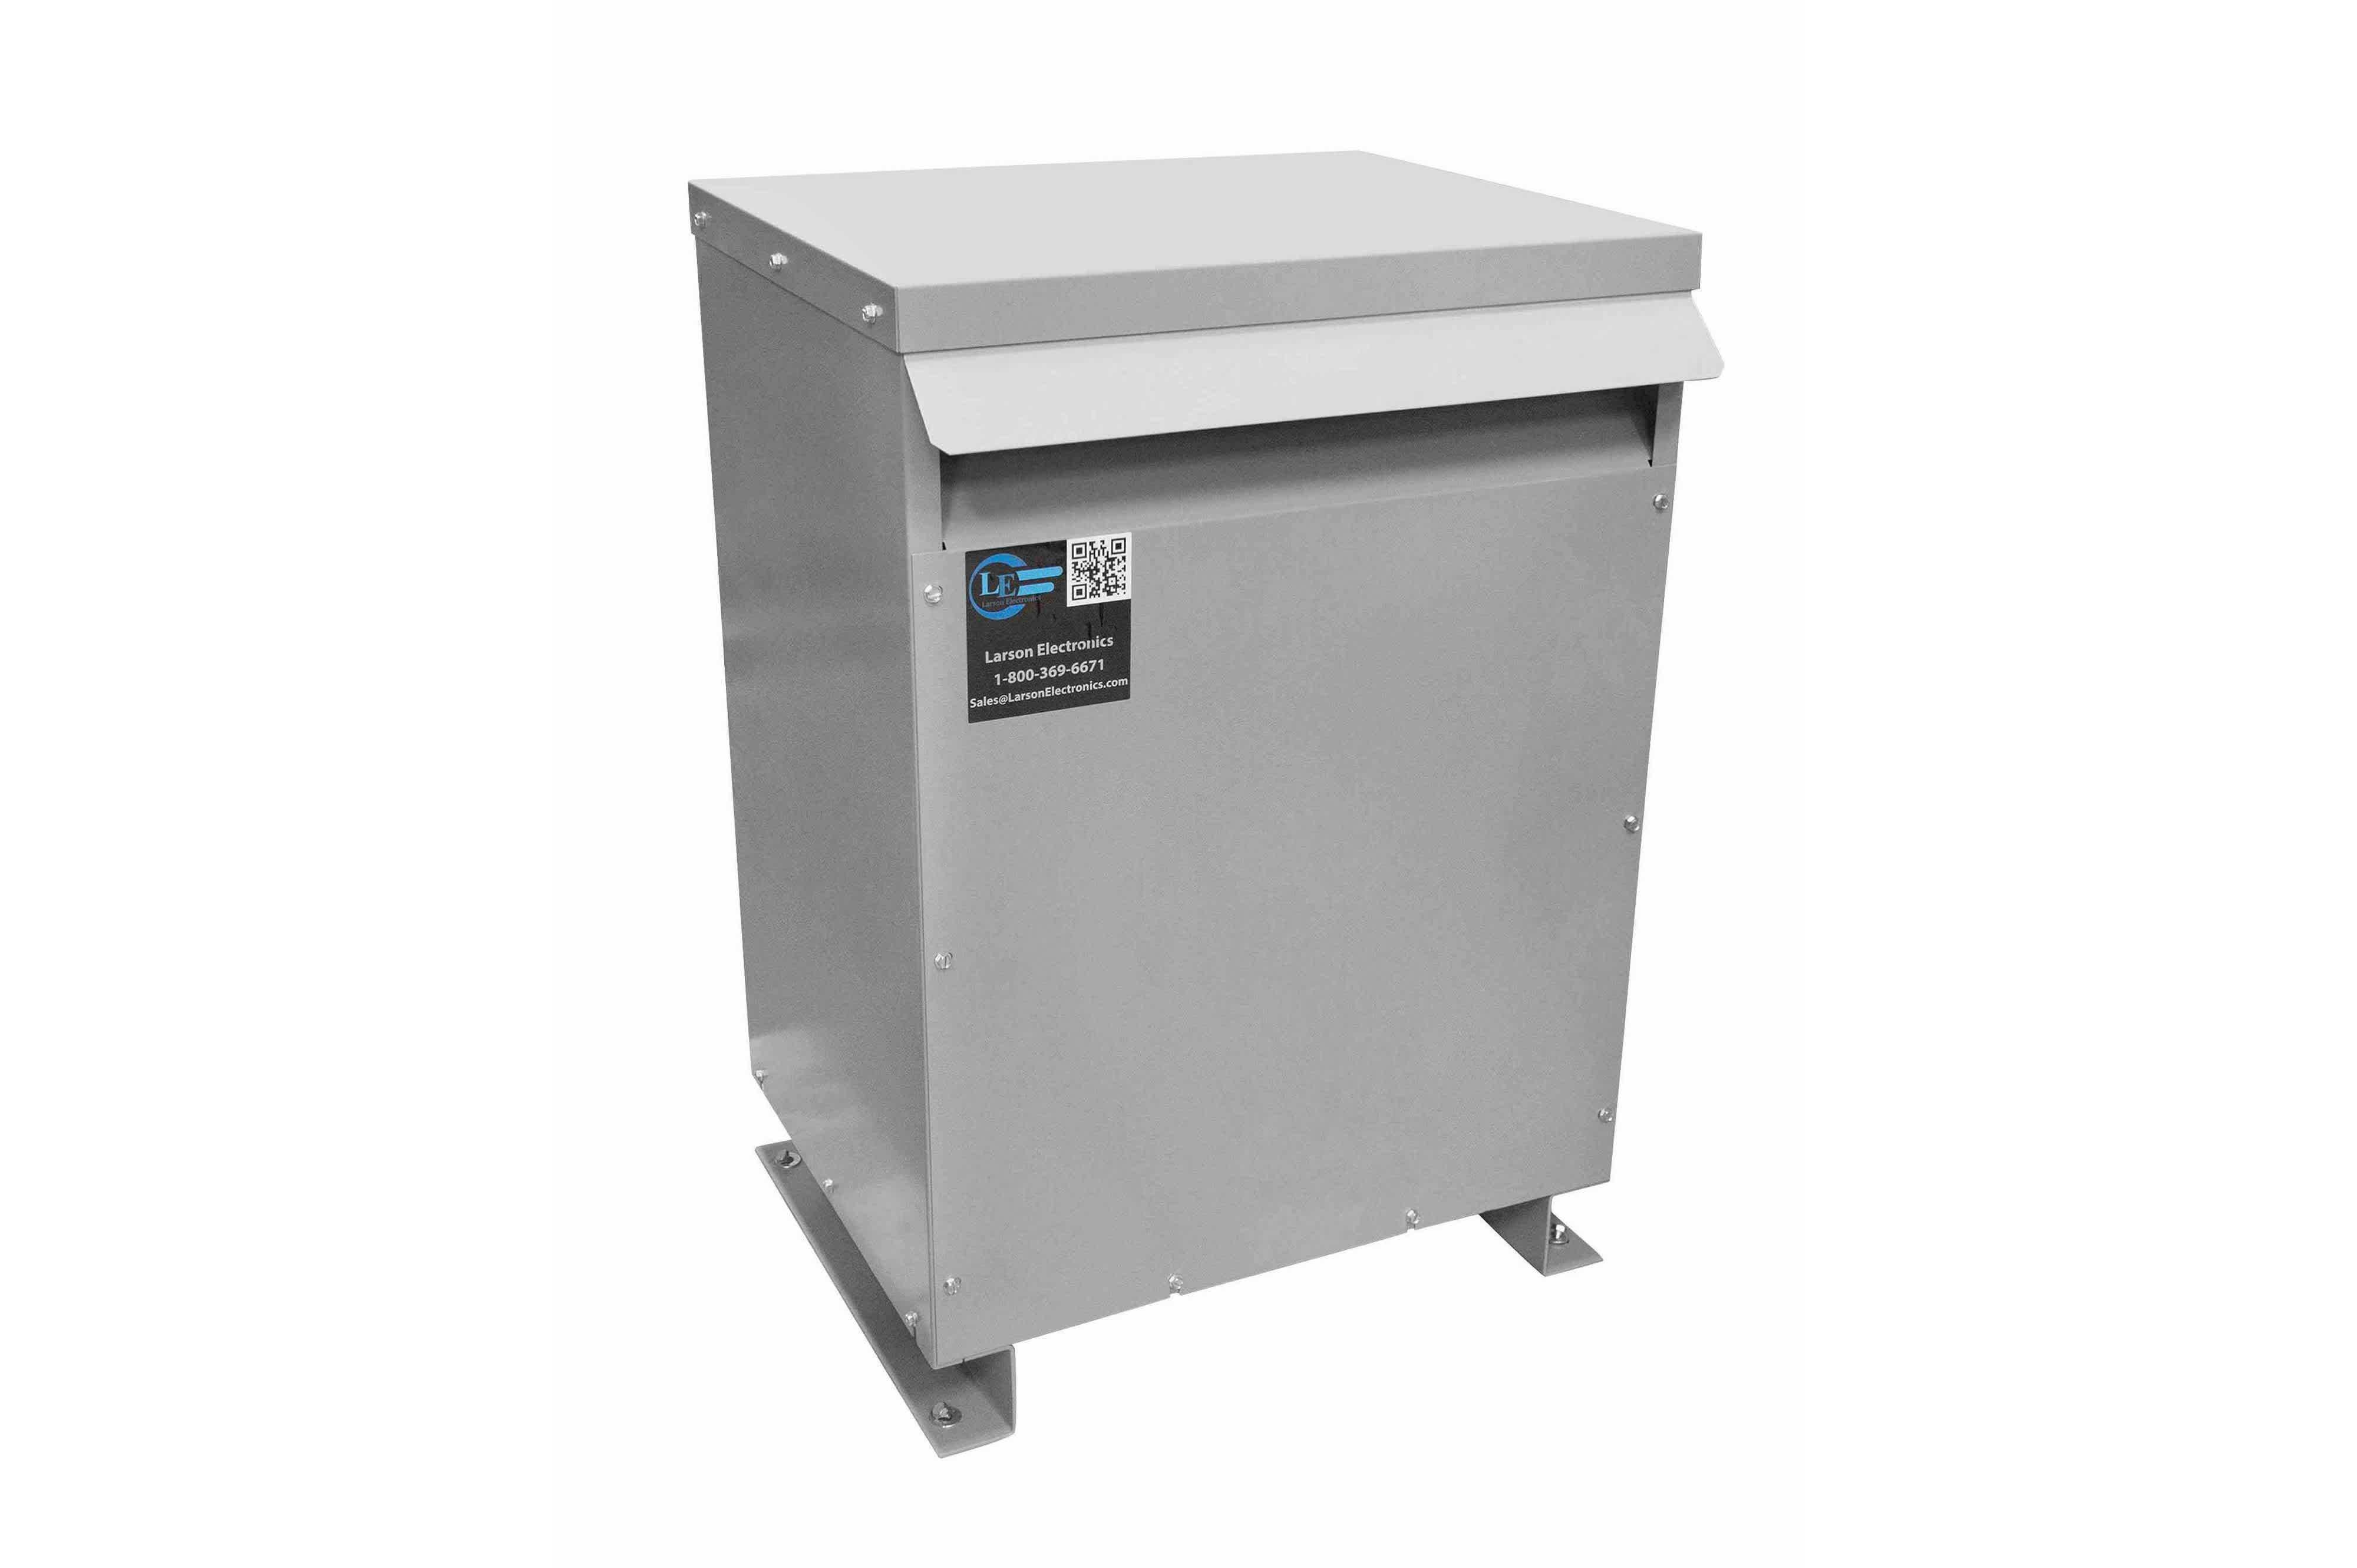 700 kVA 3PH Isolation Transformer, 480V Wye Primary, 240V Delta Secondary, N3R, Ventilated, 60 Hz